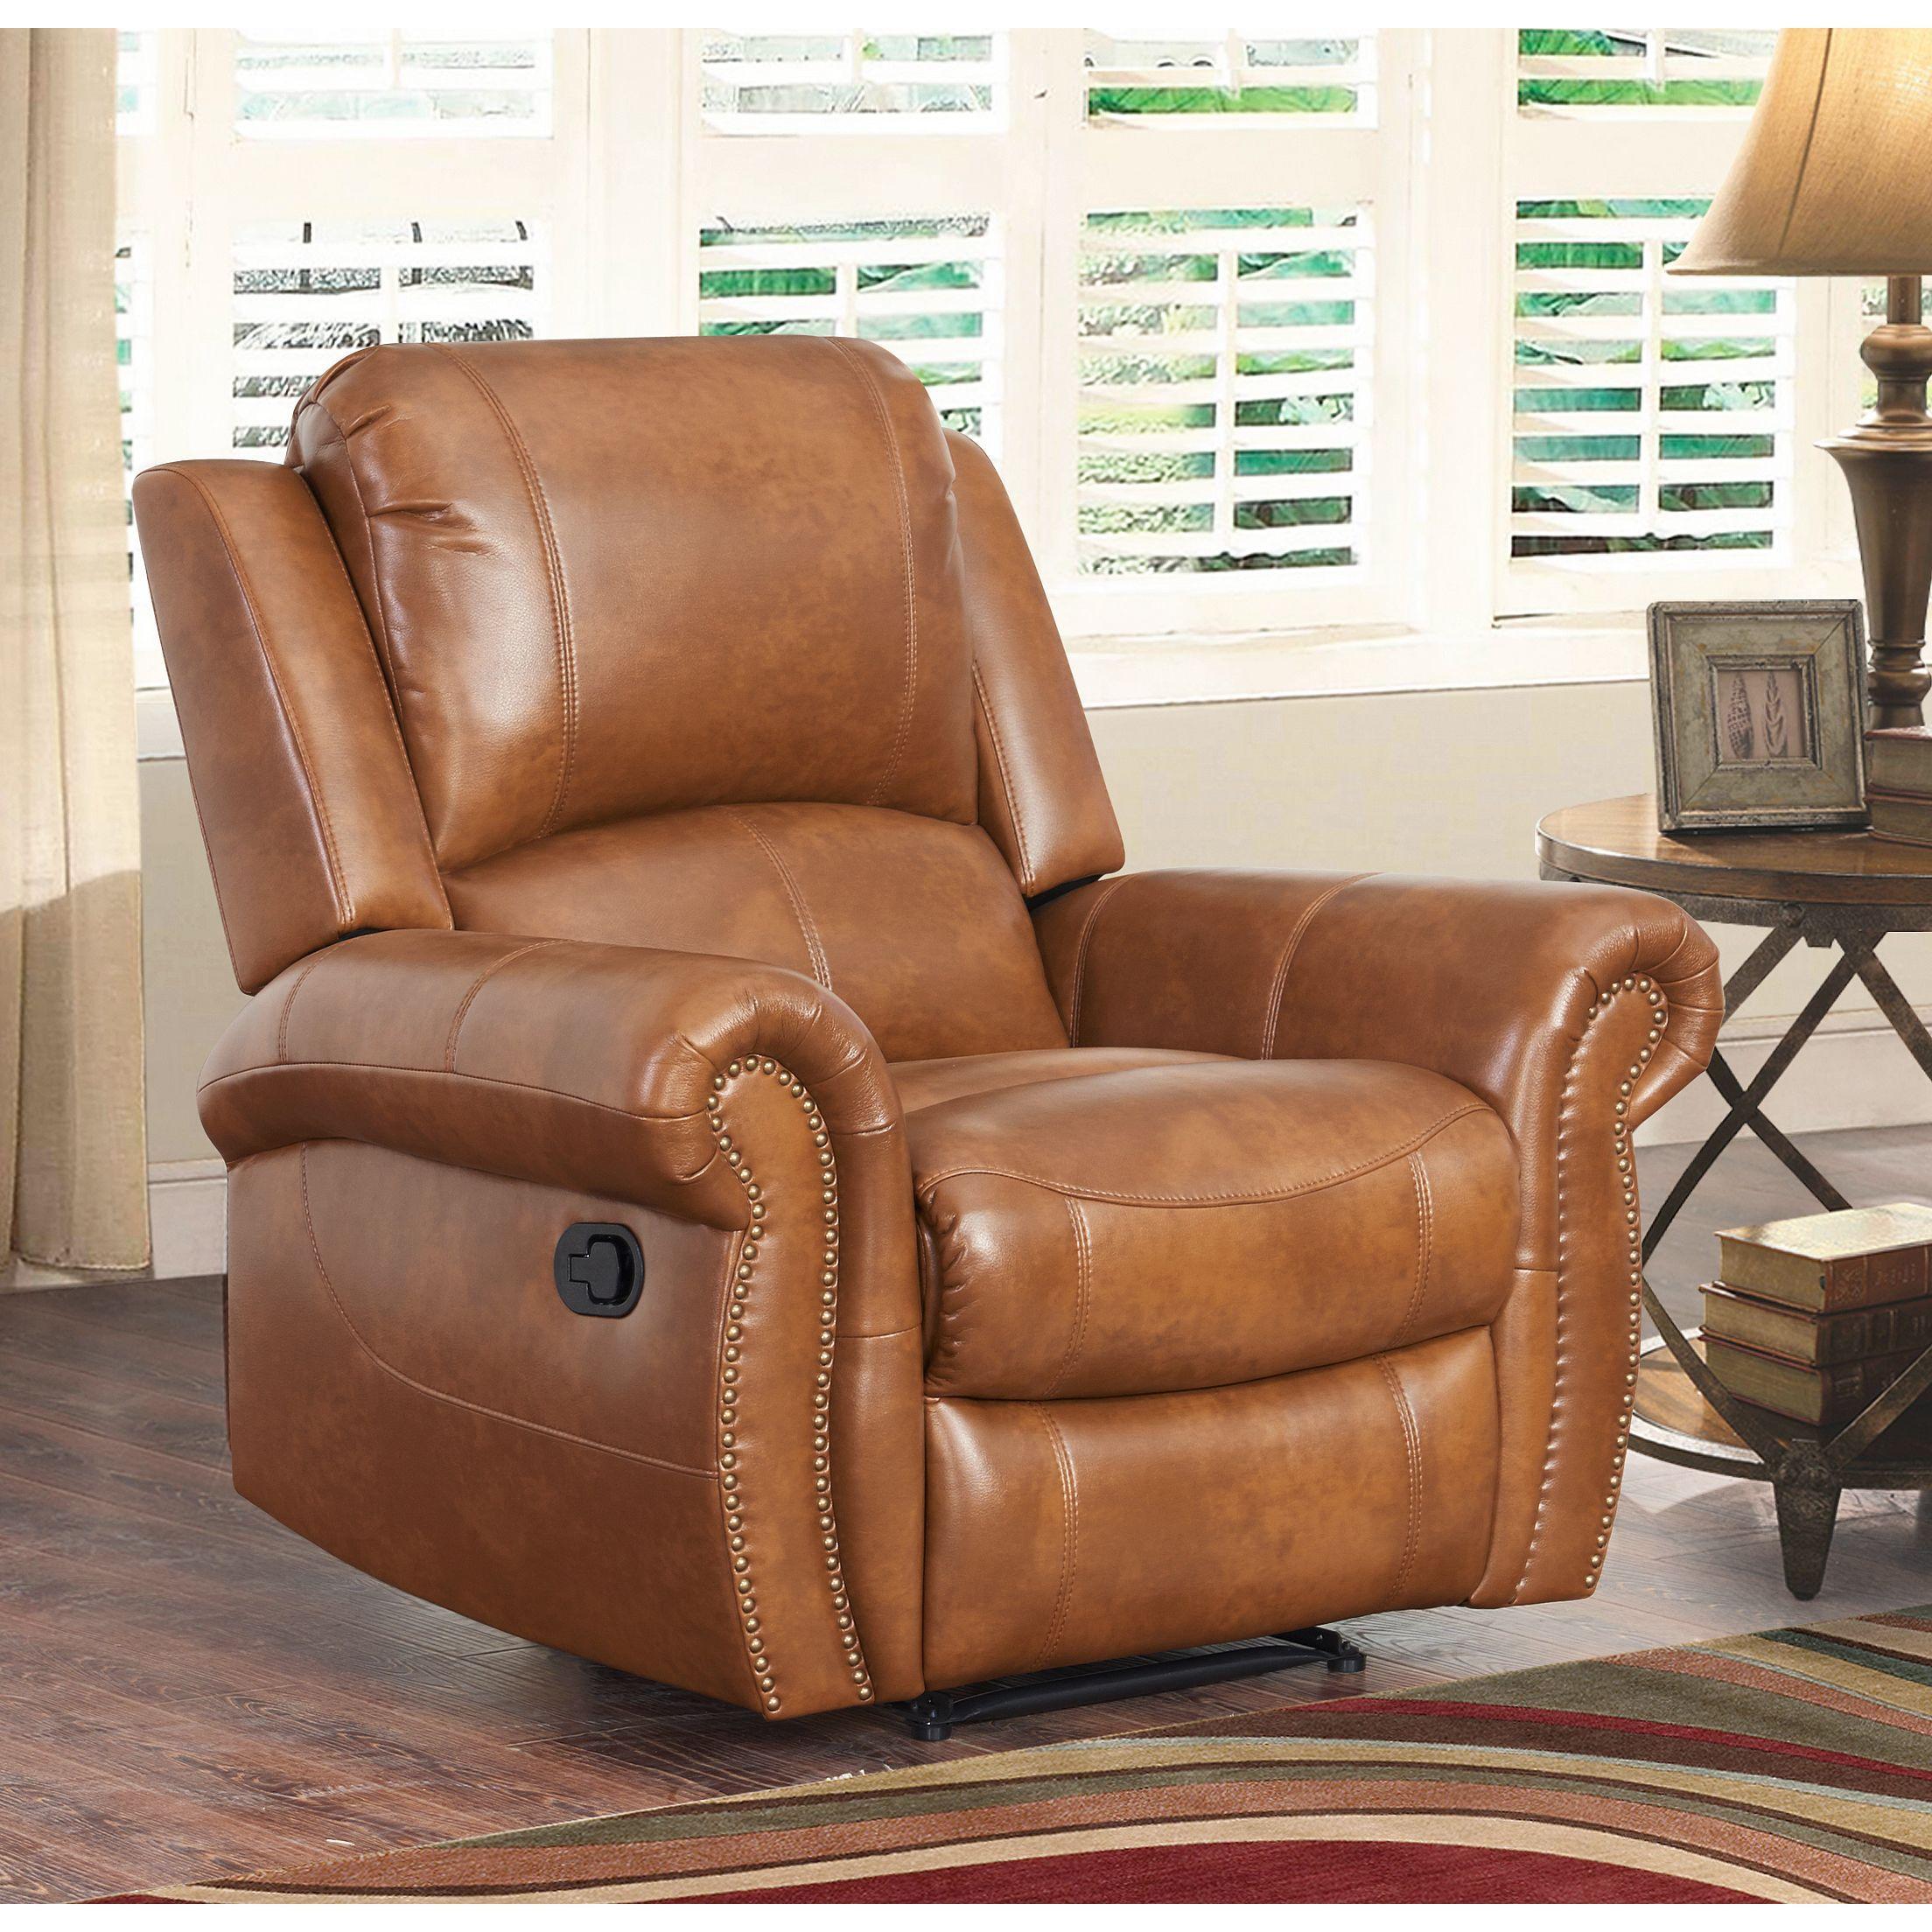 White Leather Reclining Sofa